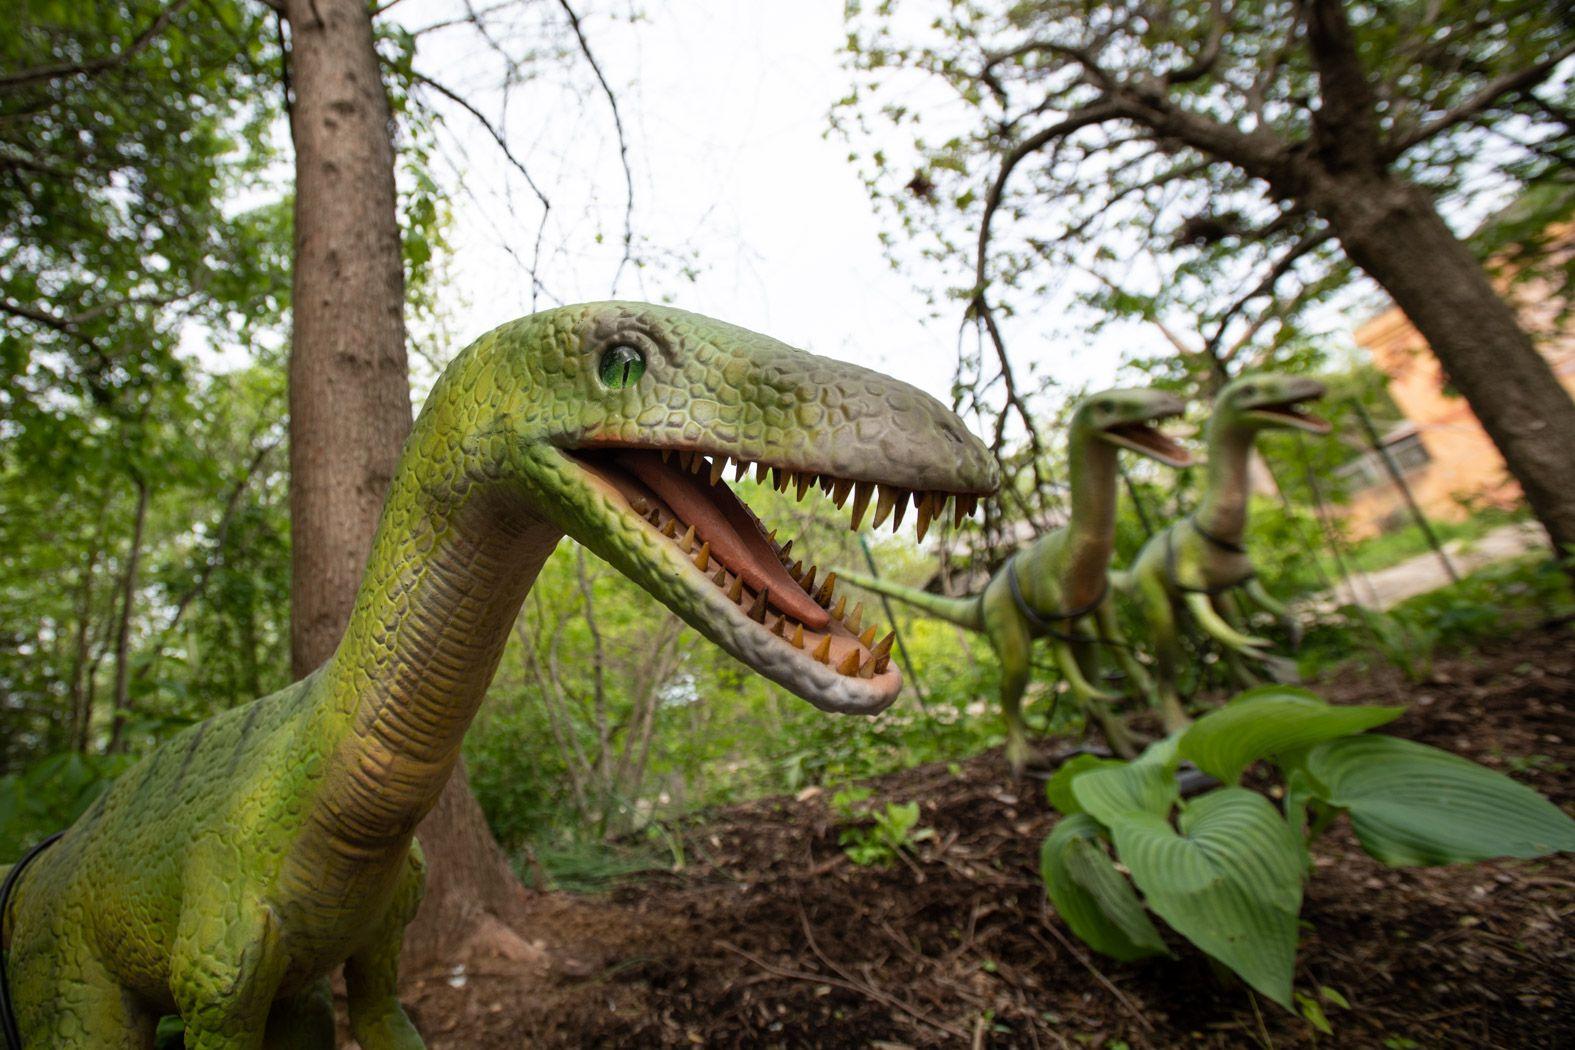 Dinosaur Island to return to Columbus Zoo this Memorial Day weekend